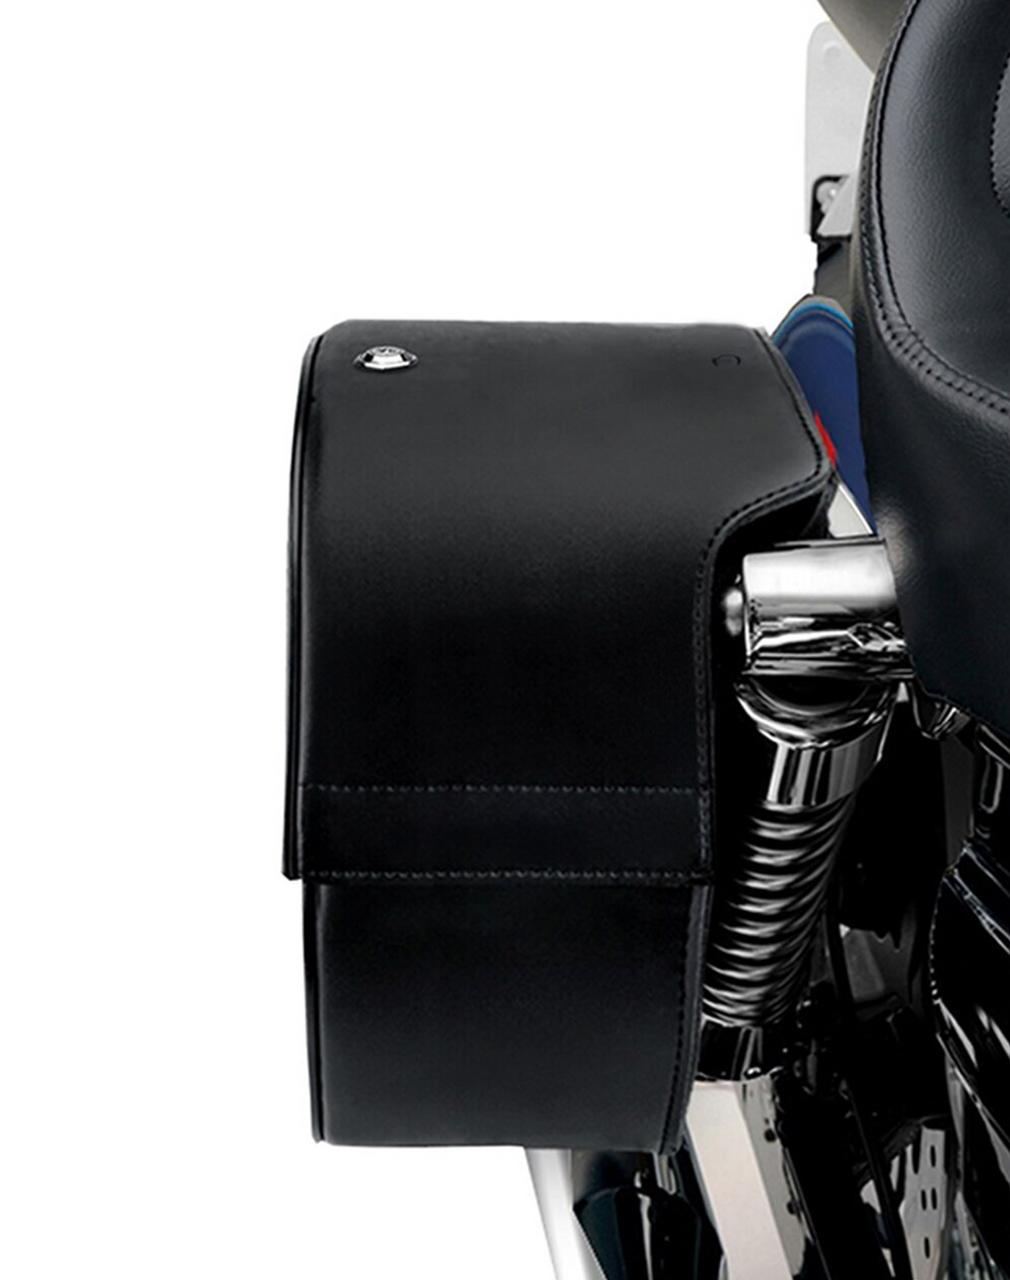 Kawasaki Eliminator 125 Charger Side Pocket With Shock Cutout Motorcycle Saddlebags Shock Cutout View